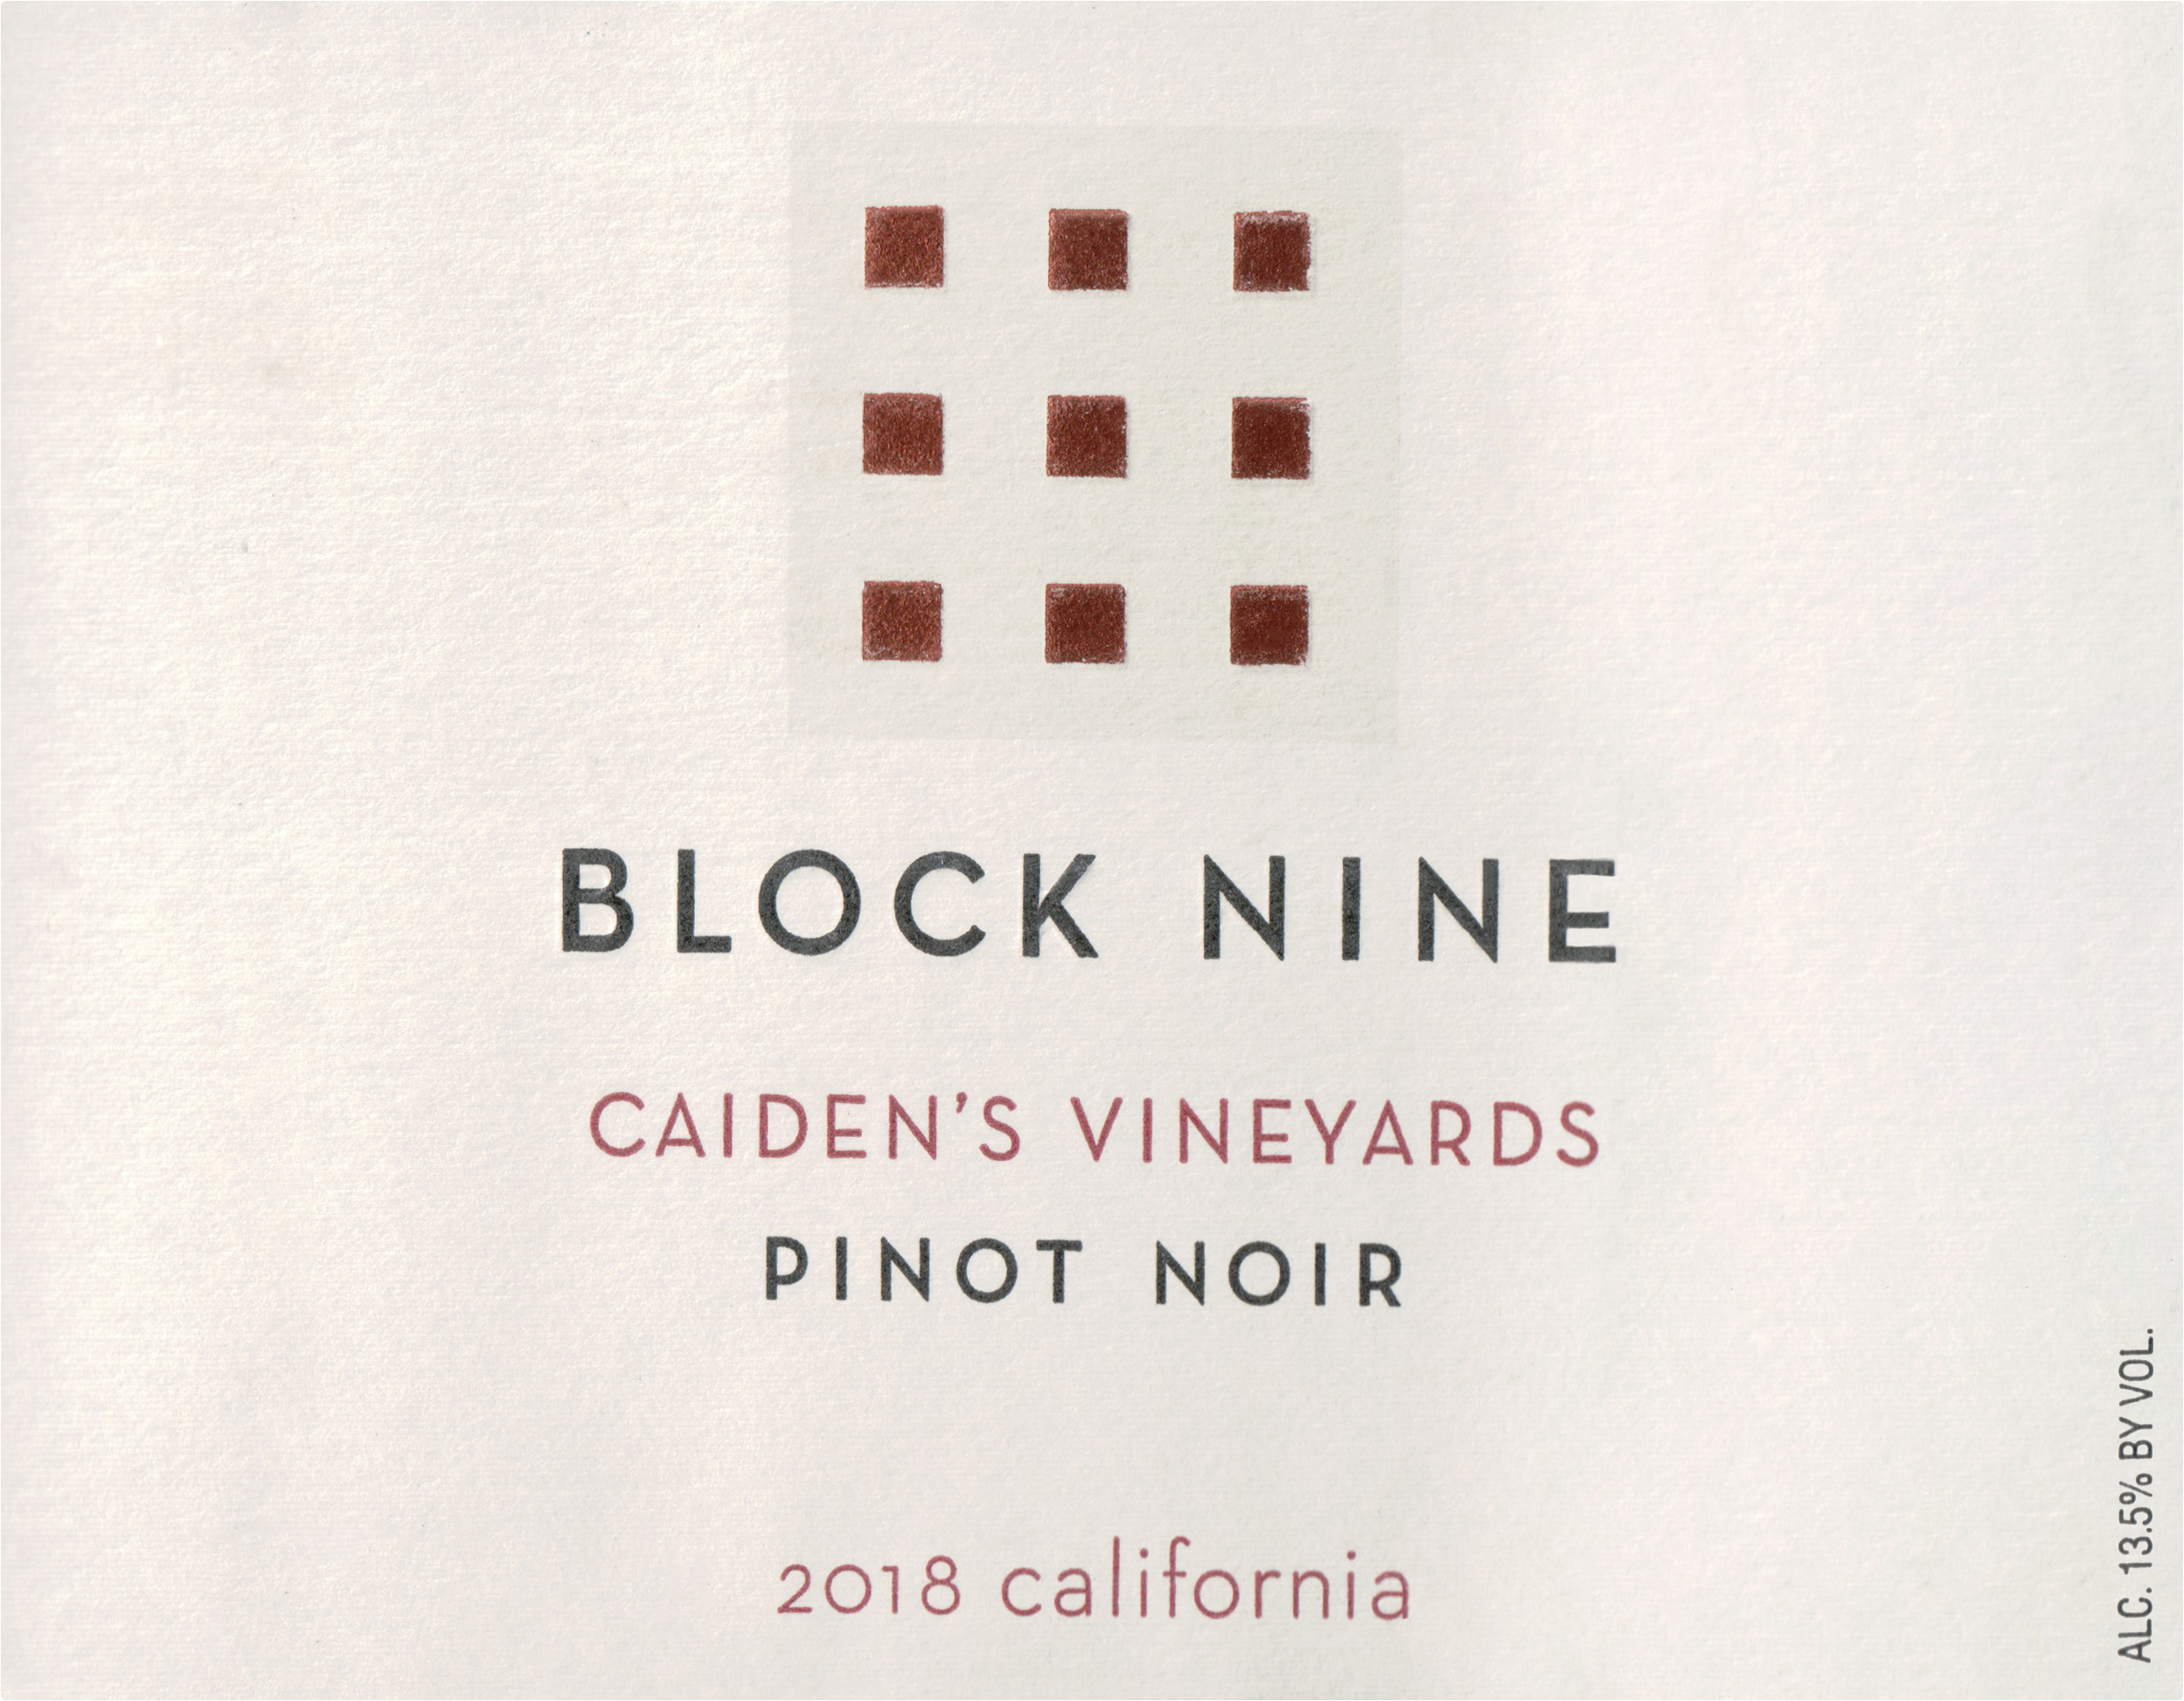 Block Nine Caiden